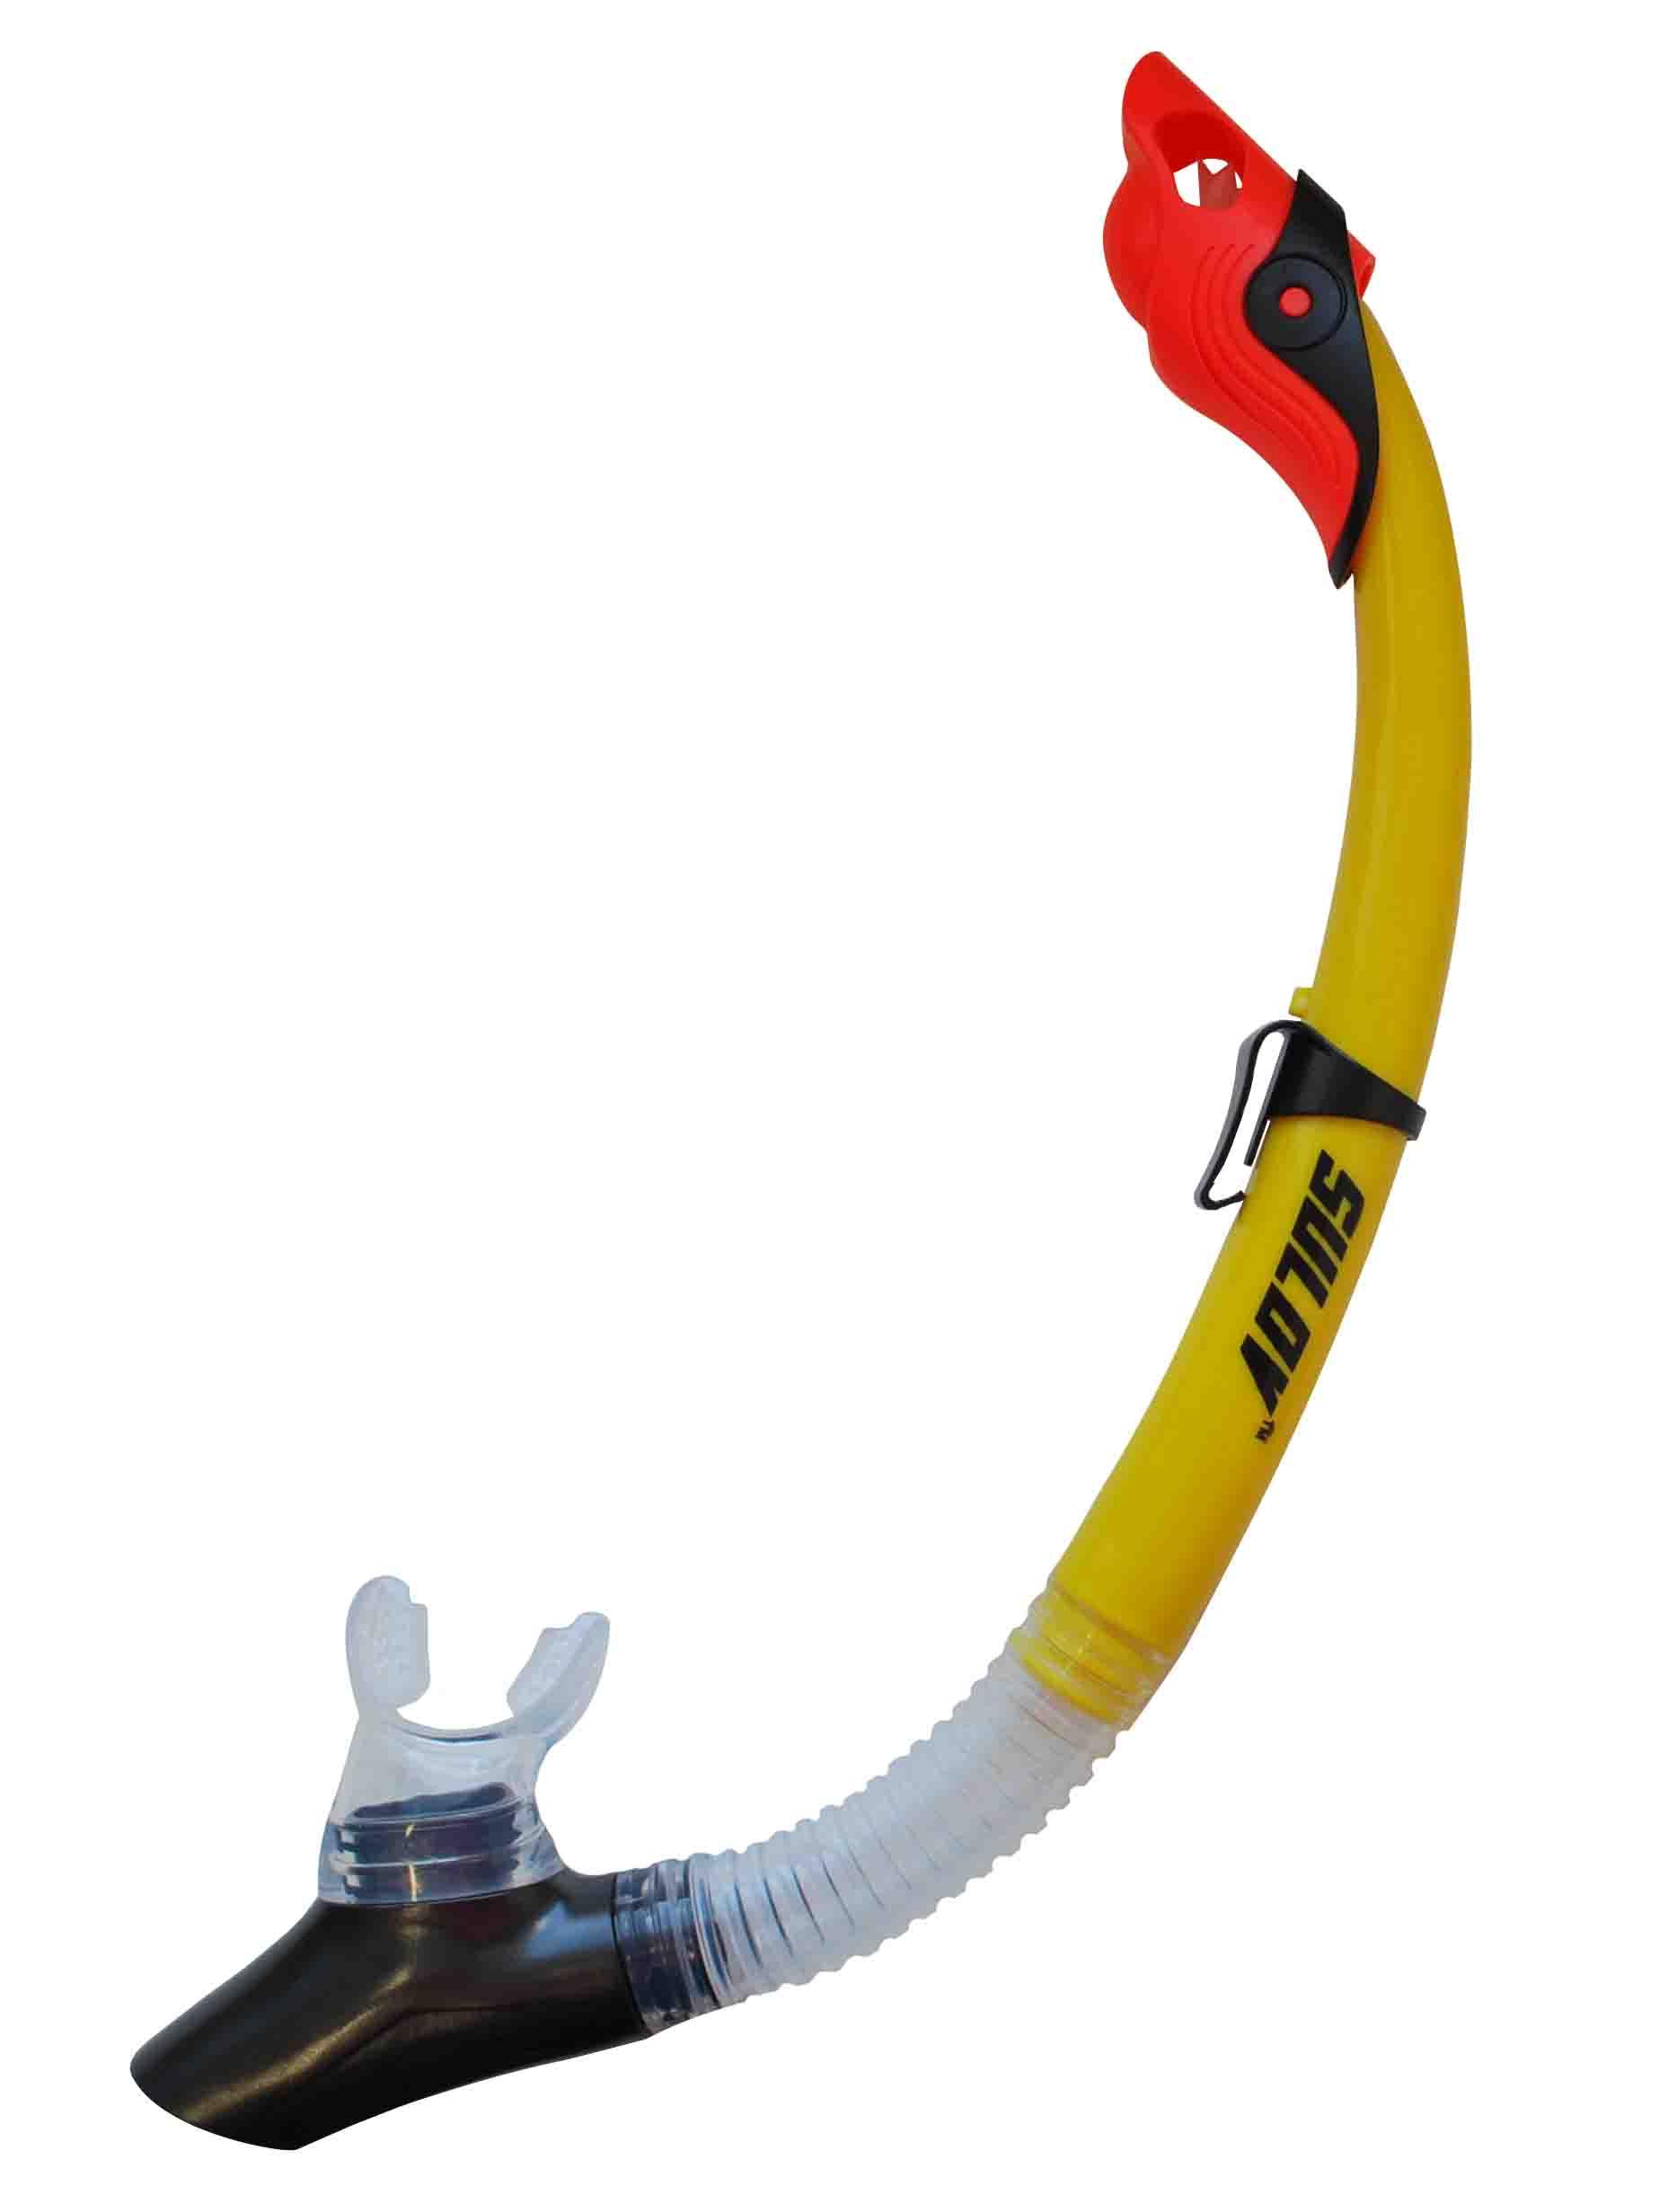 Šnorchl CALTER ADULT 117SILICON, žlutý